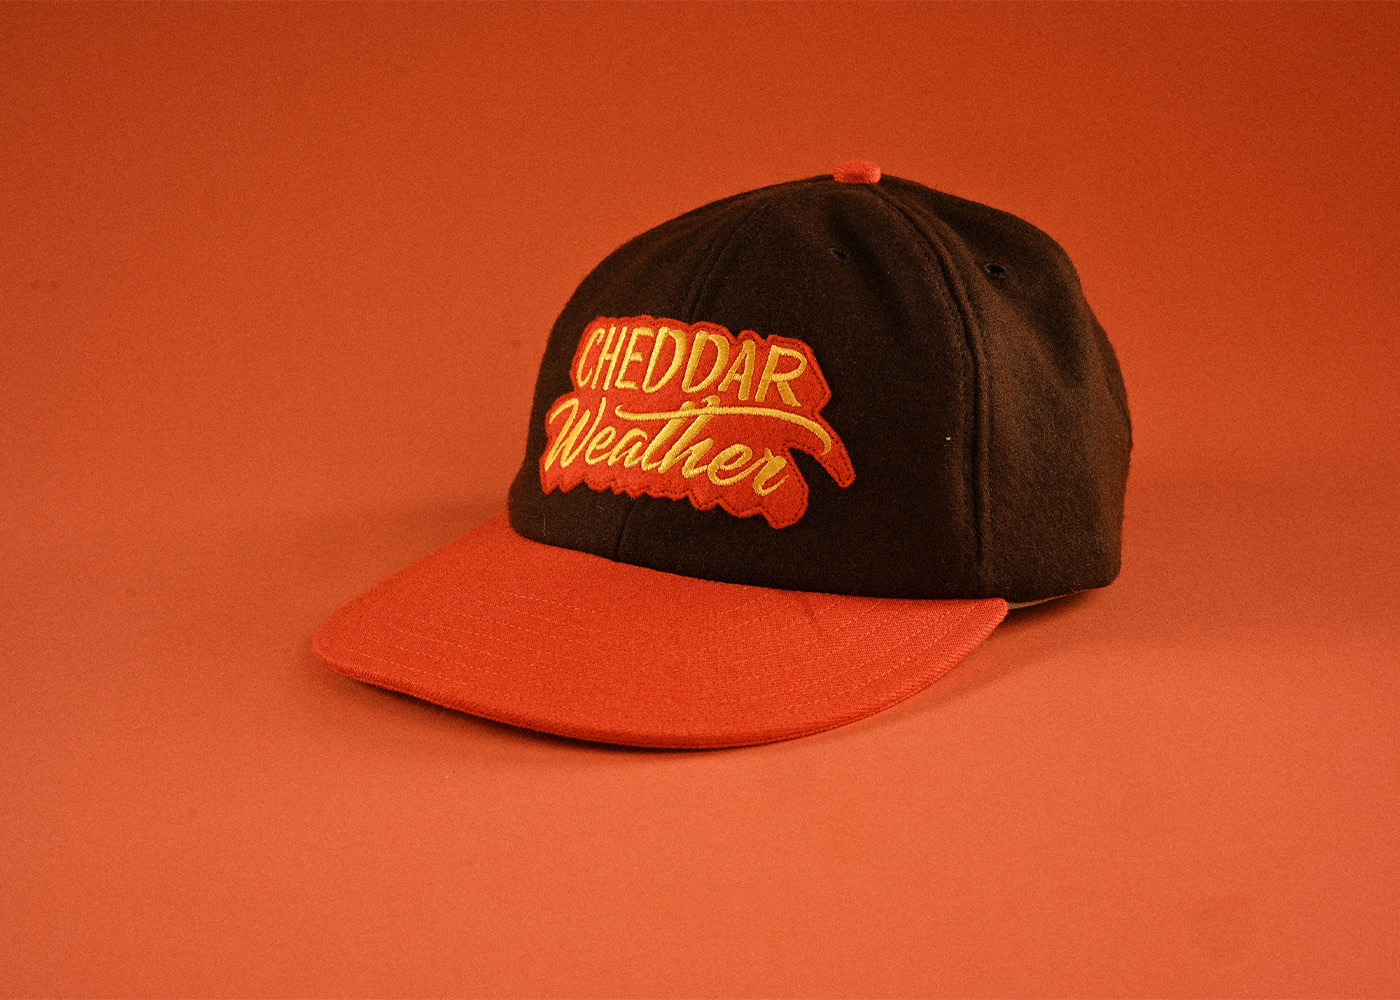 Cheddar Weather Baseball Cap on orange background.